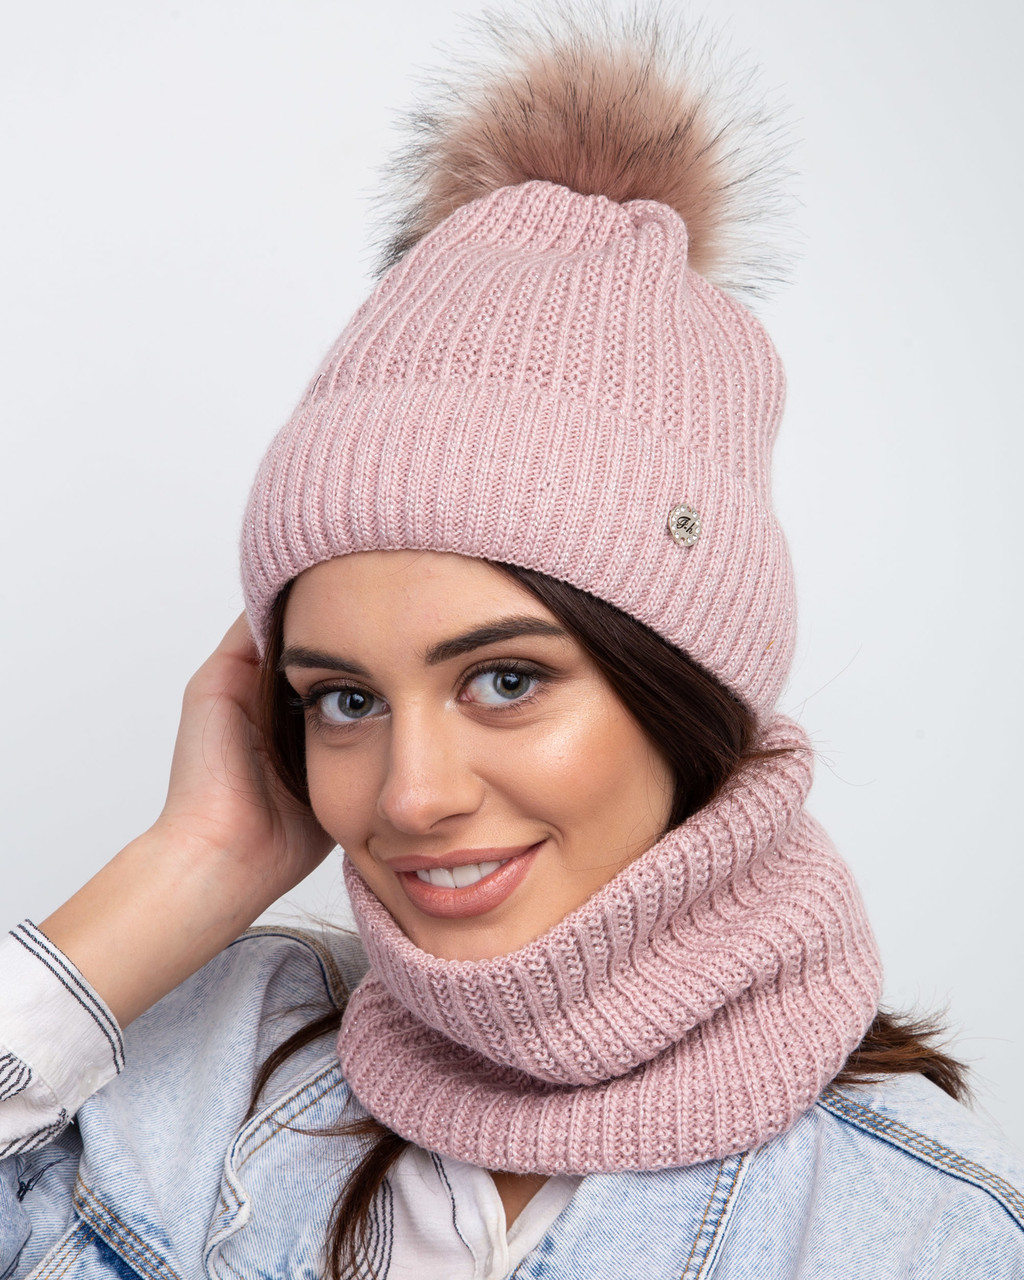 Зимний женский комплект (шапка + хомут) на флисе с помпоном  - Арт 2457